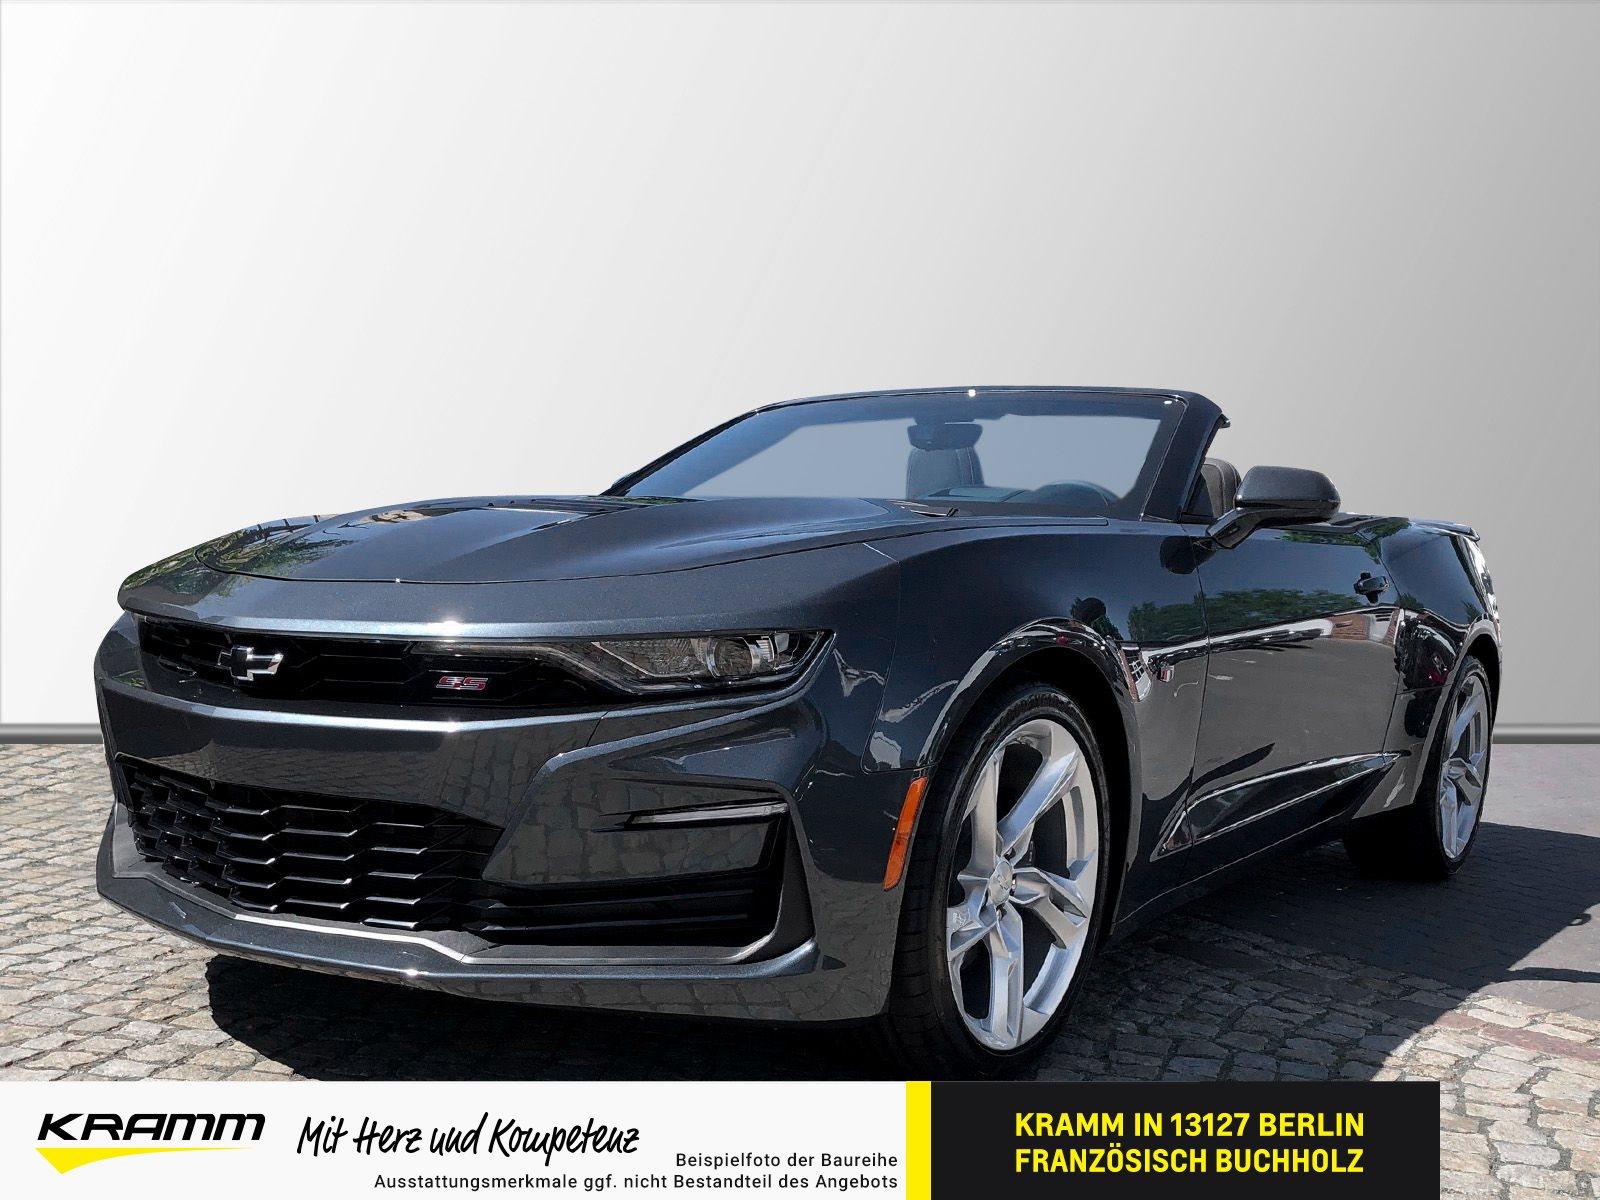 Chevrolet Camaro V8 CABRIO 6.2L AT10 Klappenauspuff, Jahr 2021, Benzin